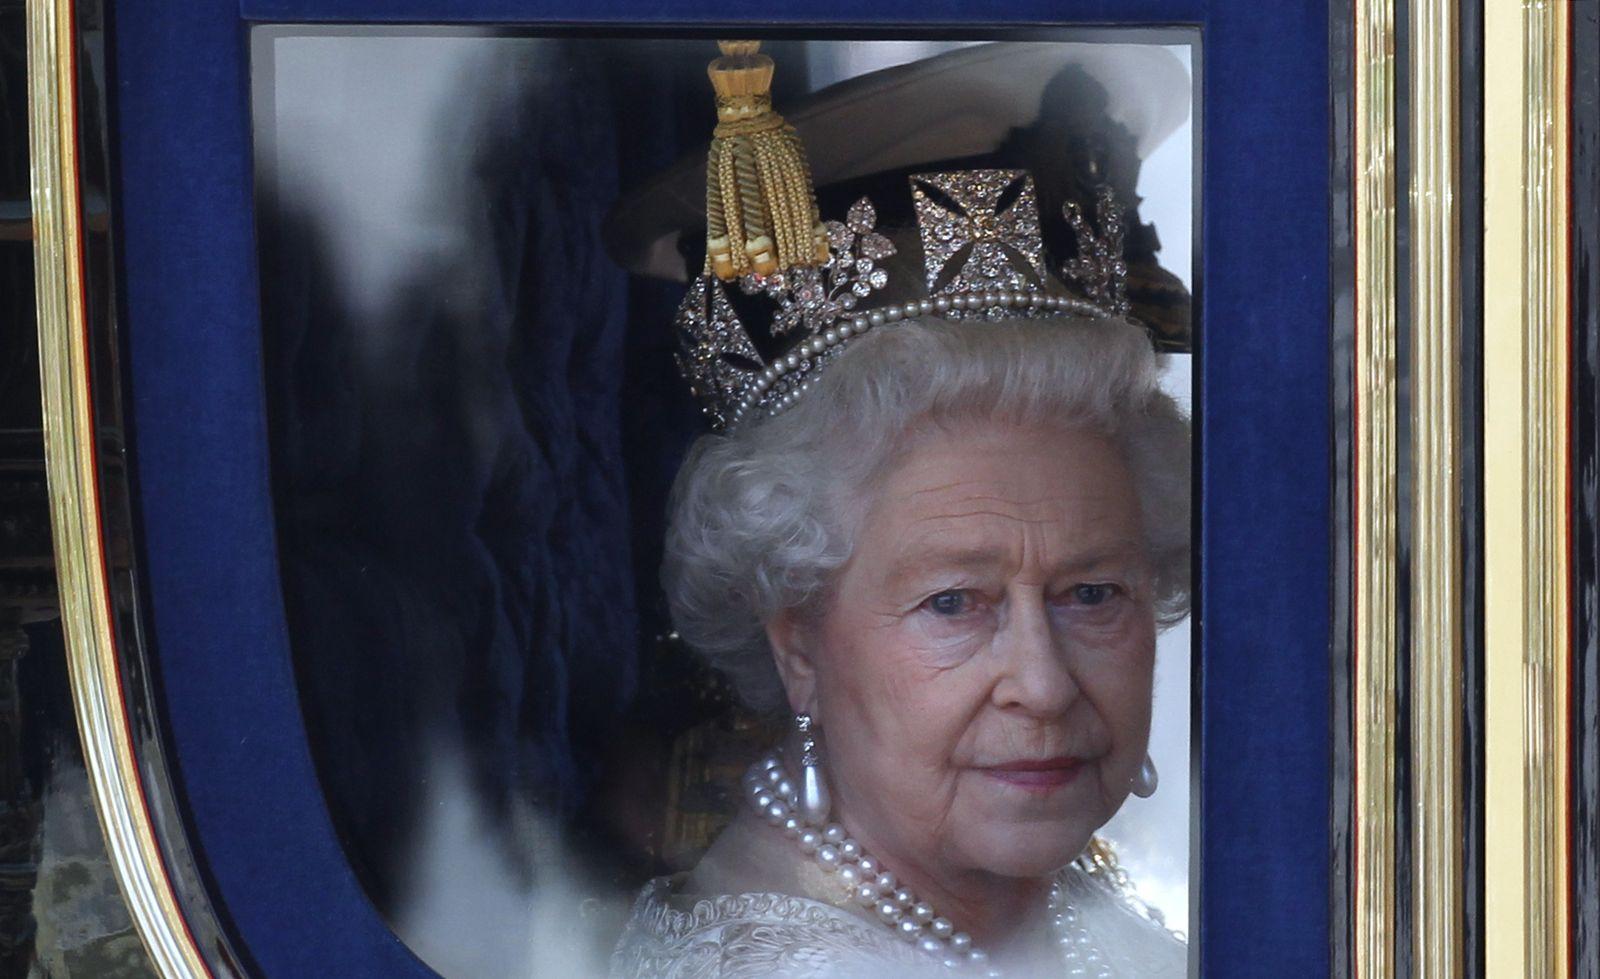 NACHRUF Queen Elizabeth II